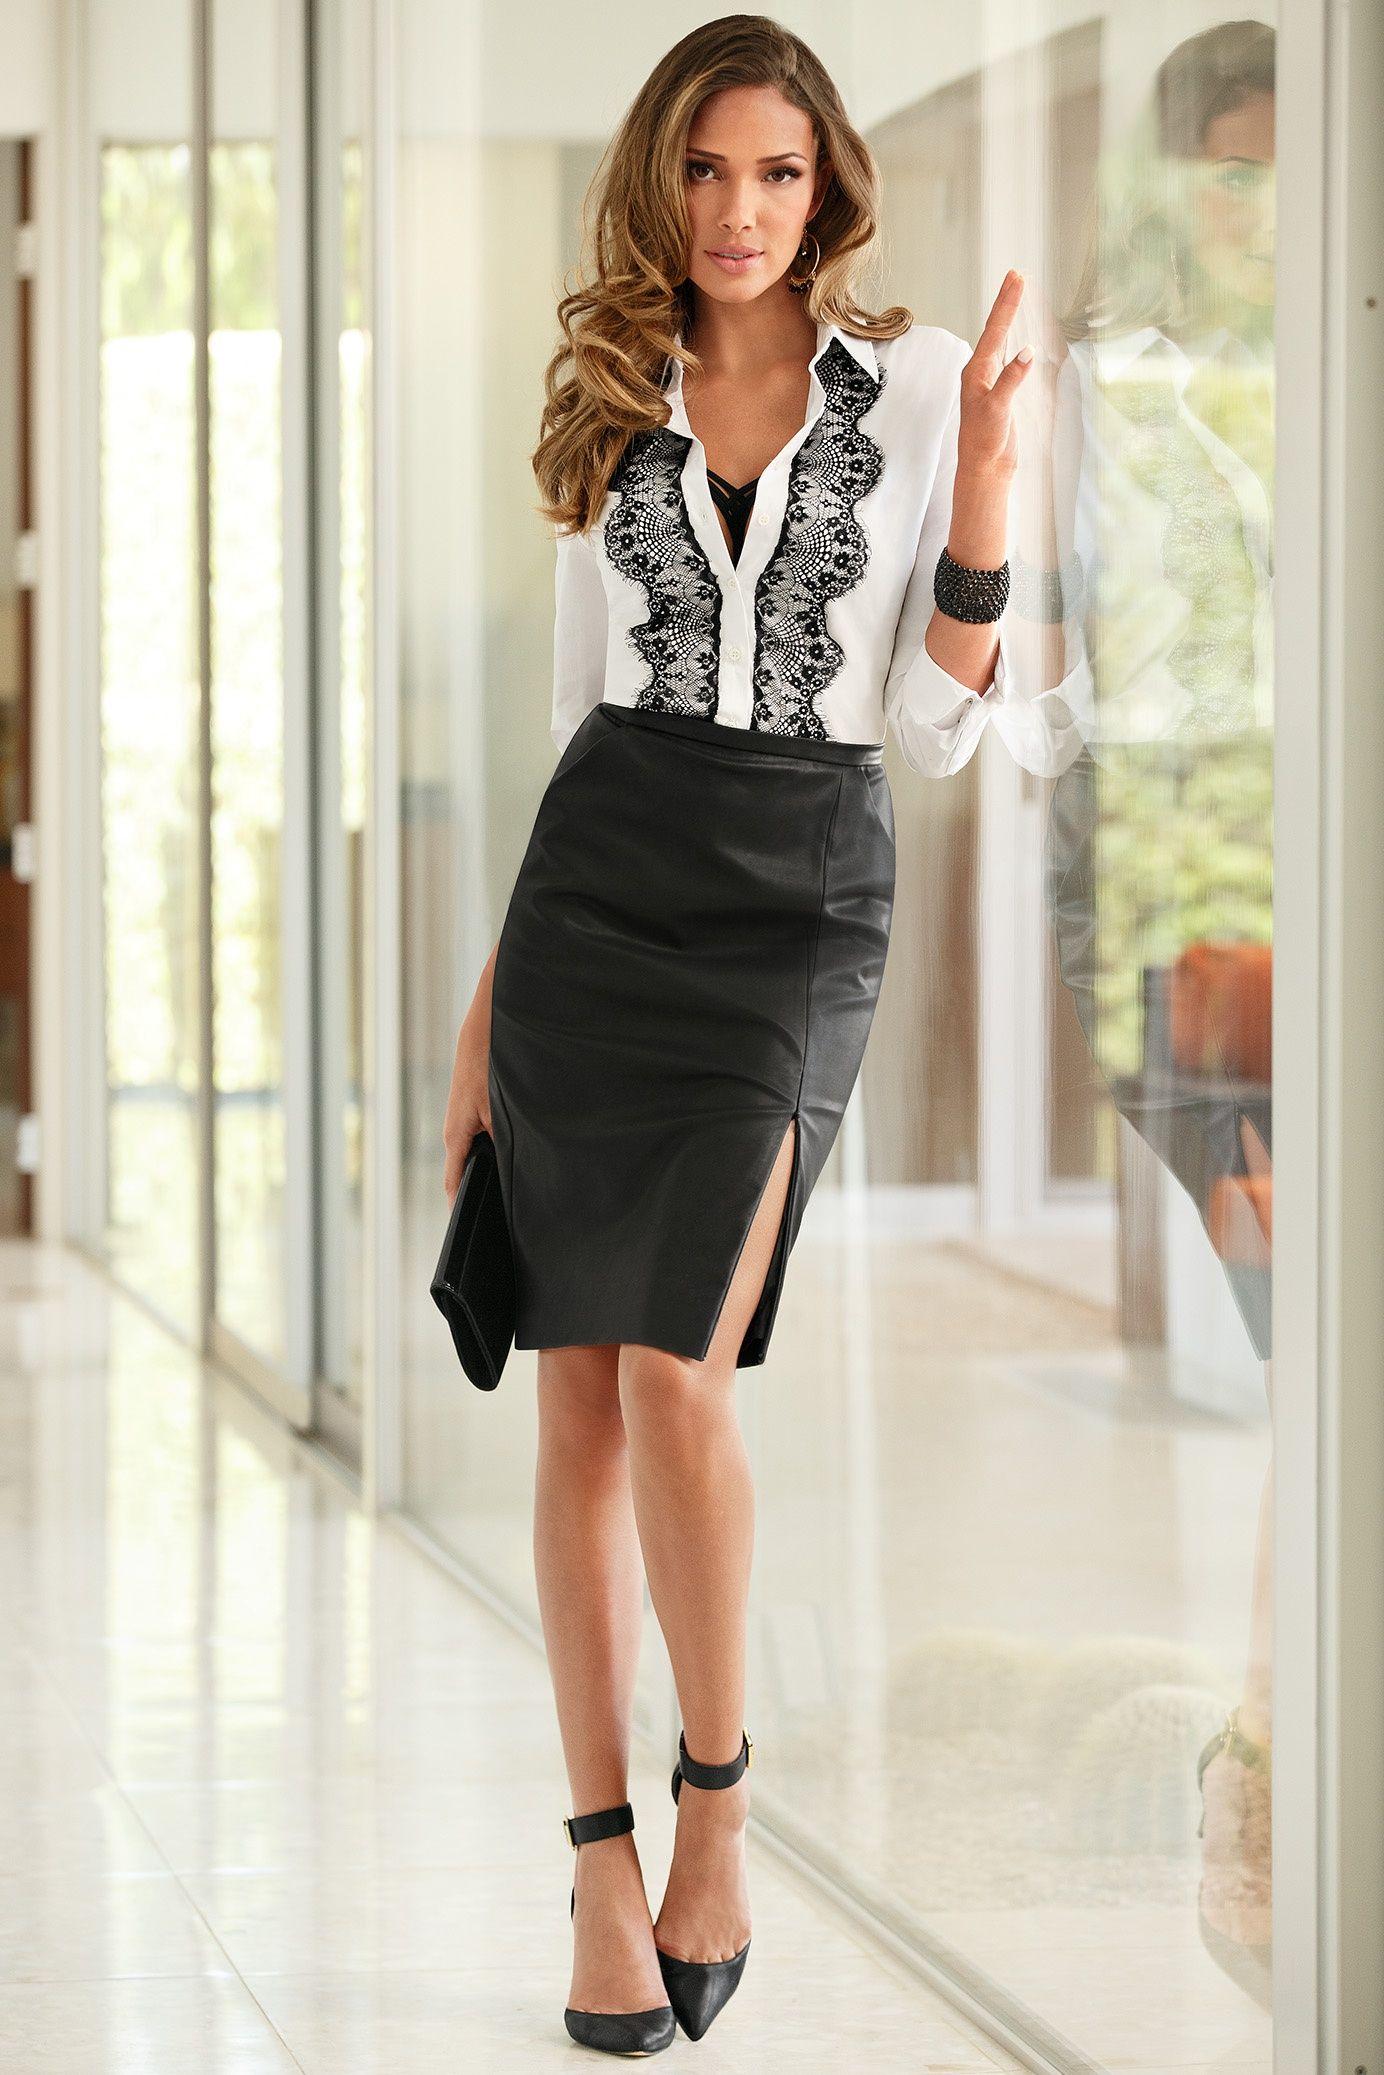 Boston Proper Faux leather pencil skirt #bostonproper | for my ...